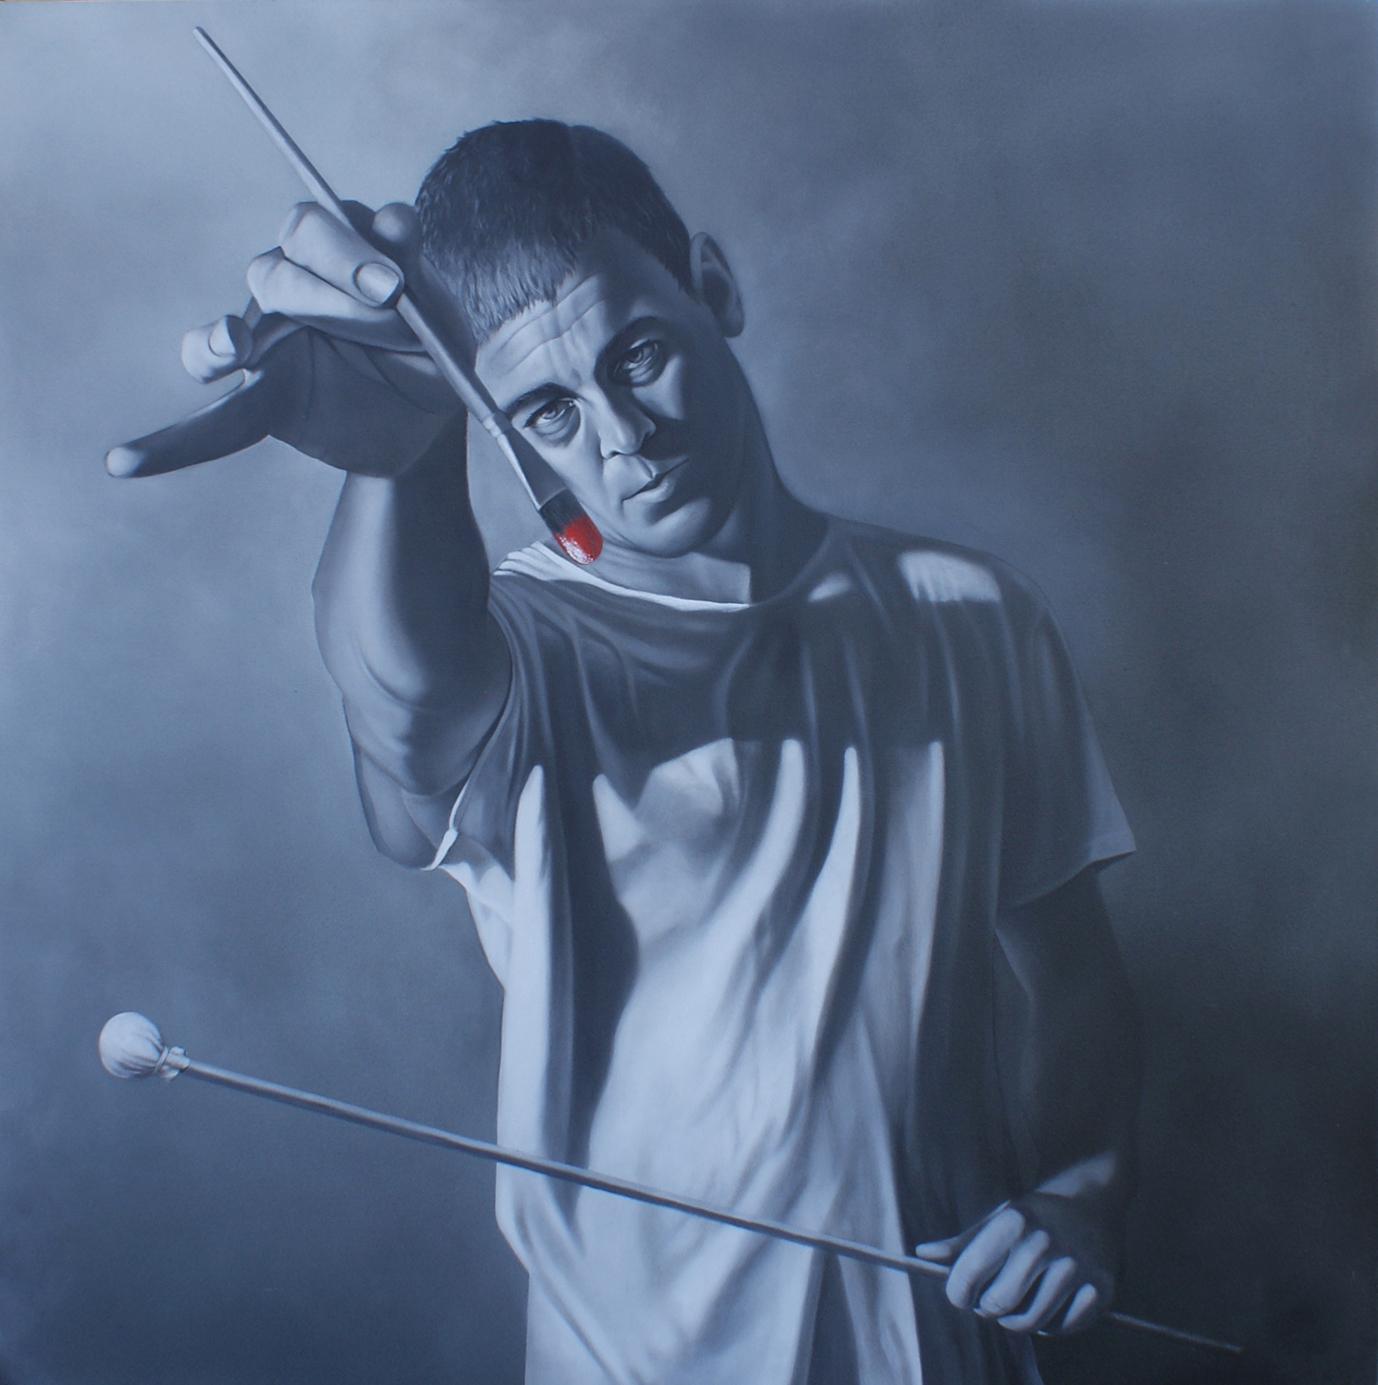 5.The Painter (self-portrait).jpg